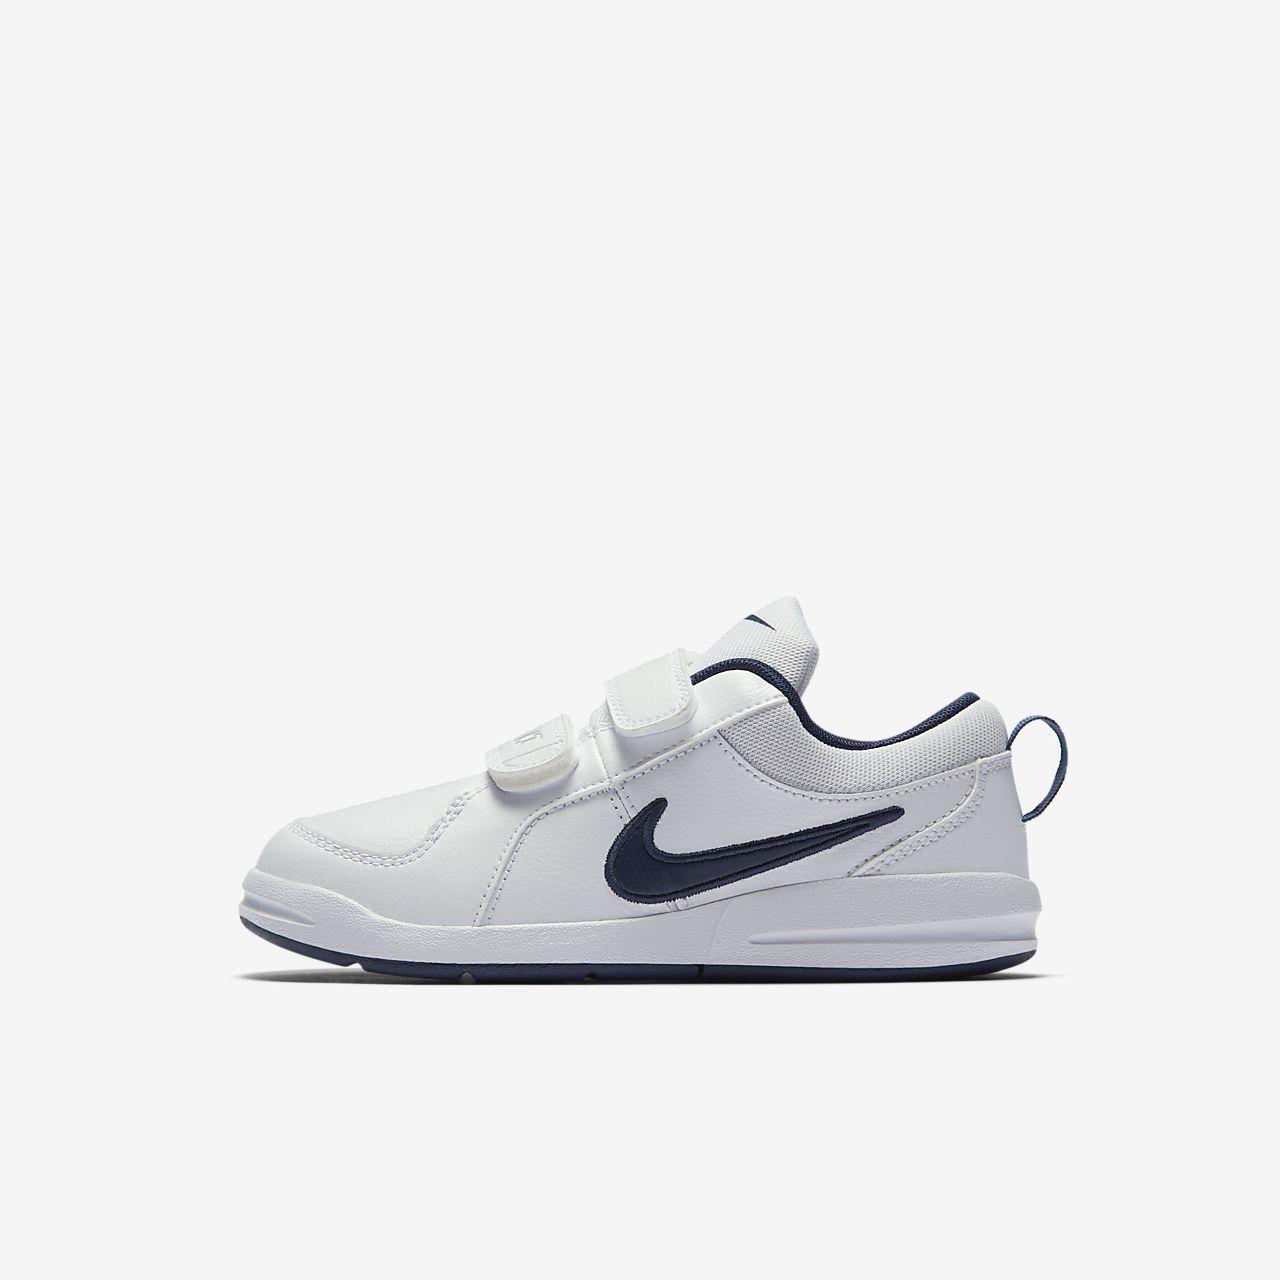 Nike Pico 4 cipő gyerekeknek